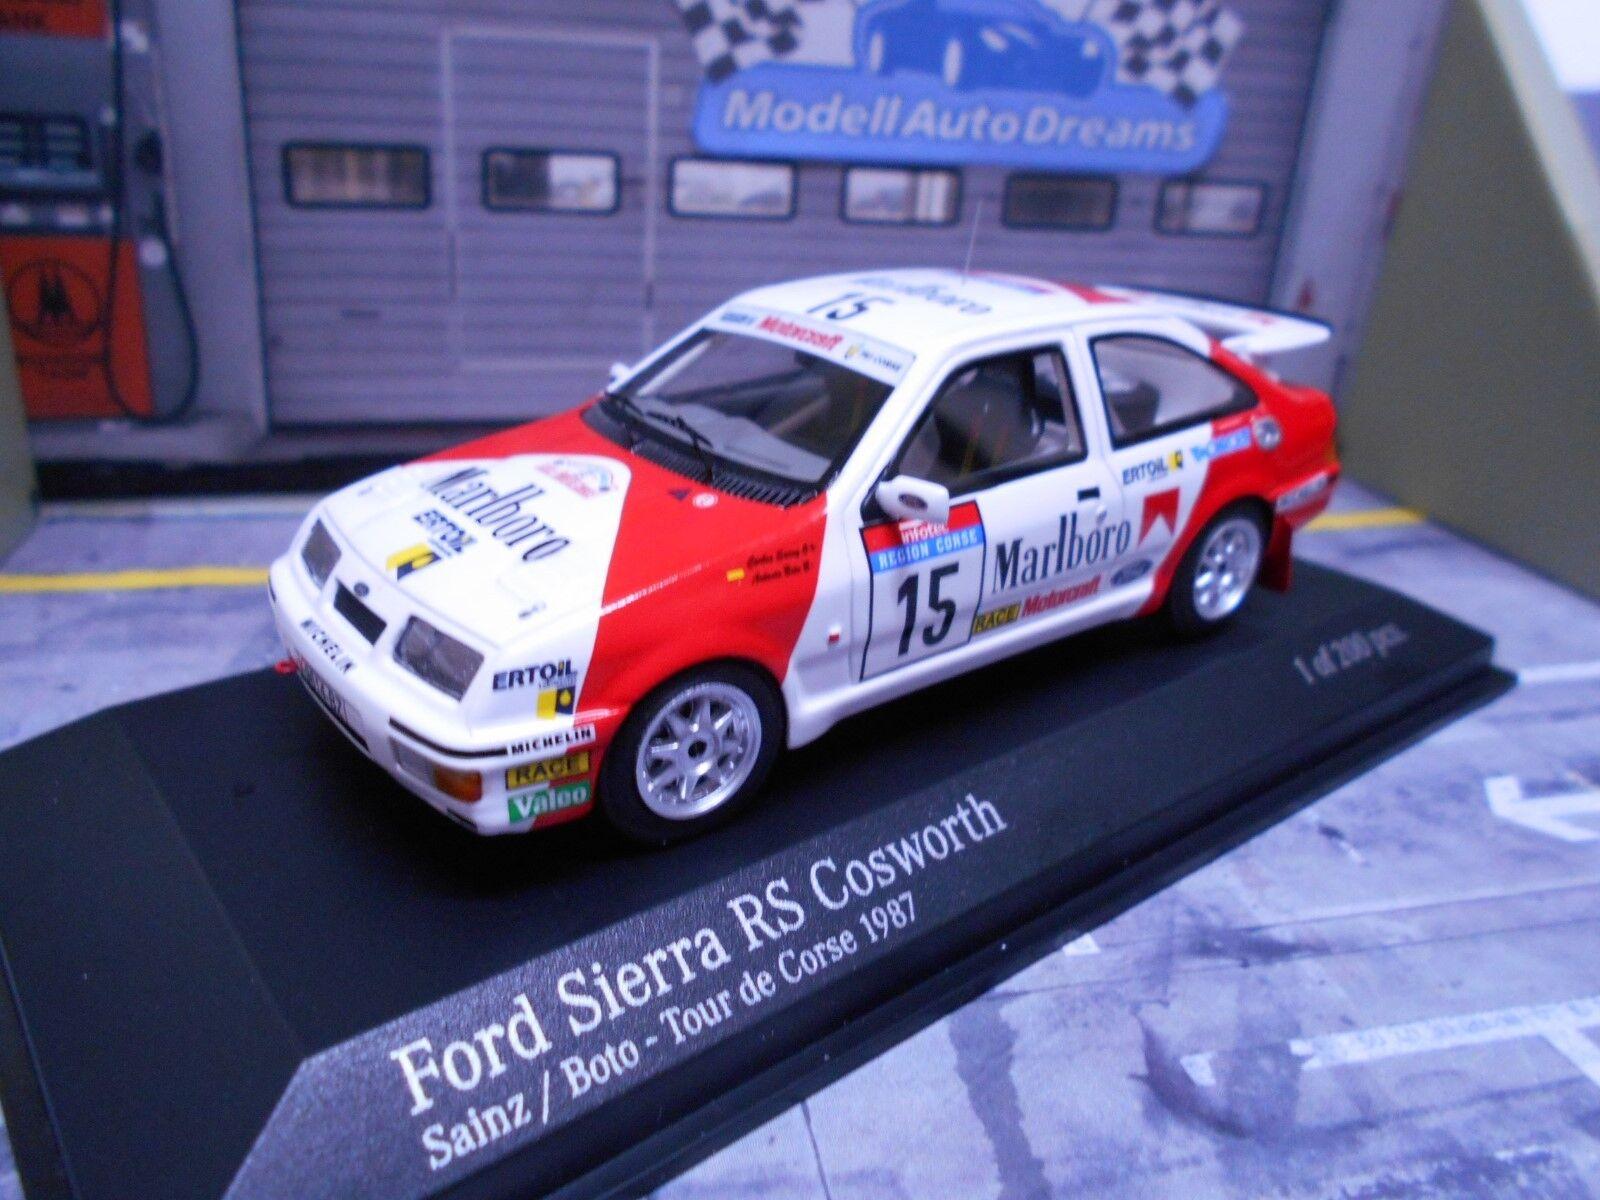 FORD Sierra Cosworth RS RALLY 1987 sainz tour de corse marlbo Minichamps 1 43